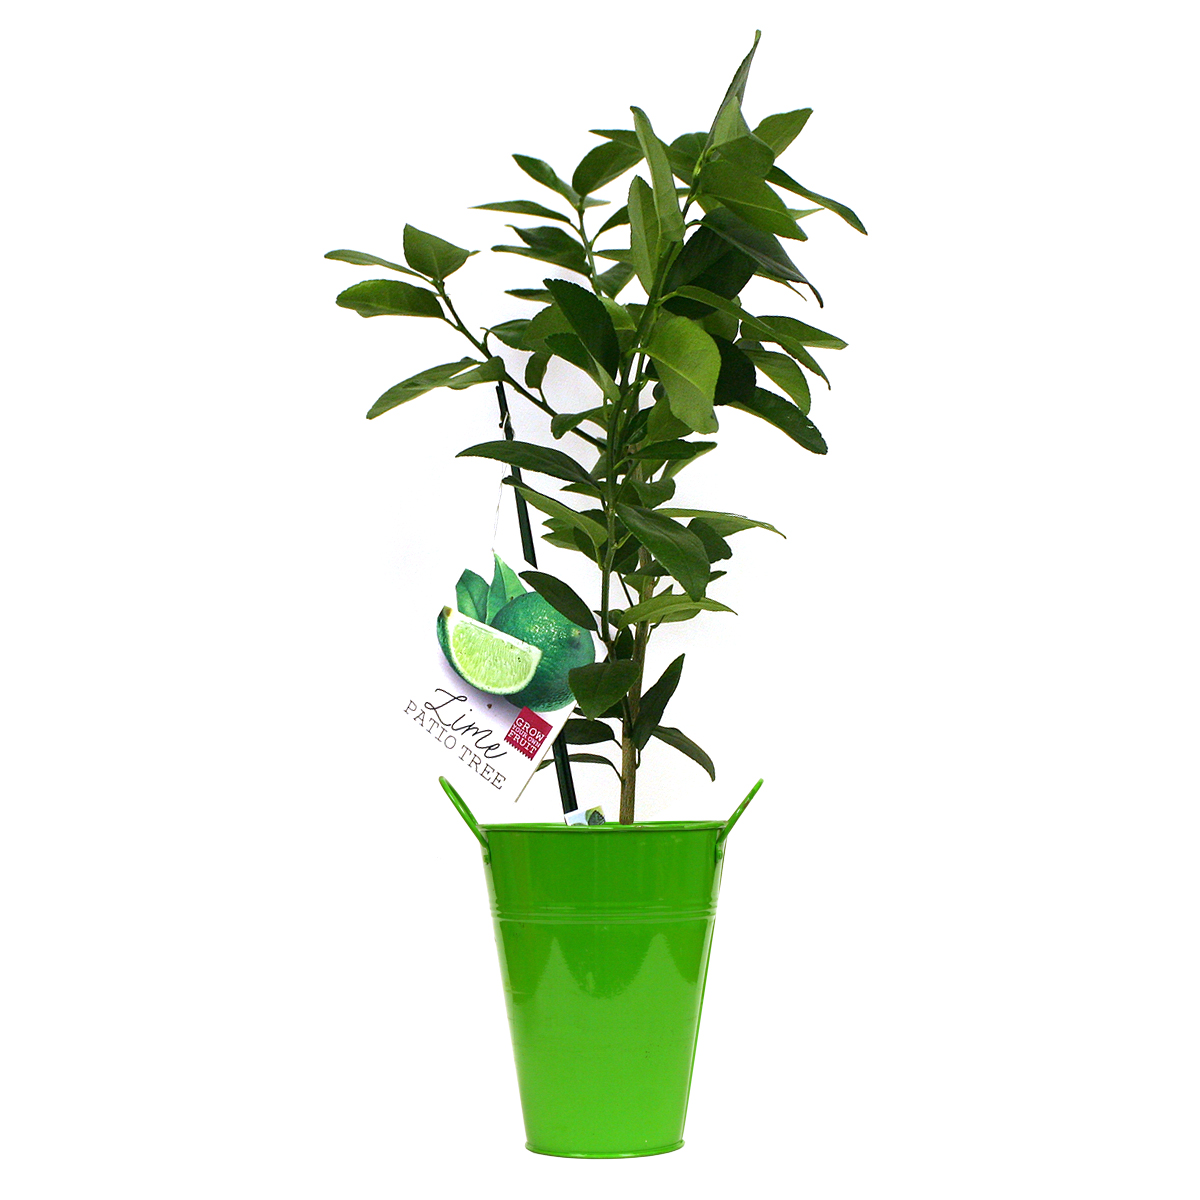 van zyverden persian lime citrus tree in decorative patio planter